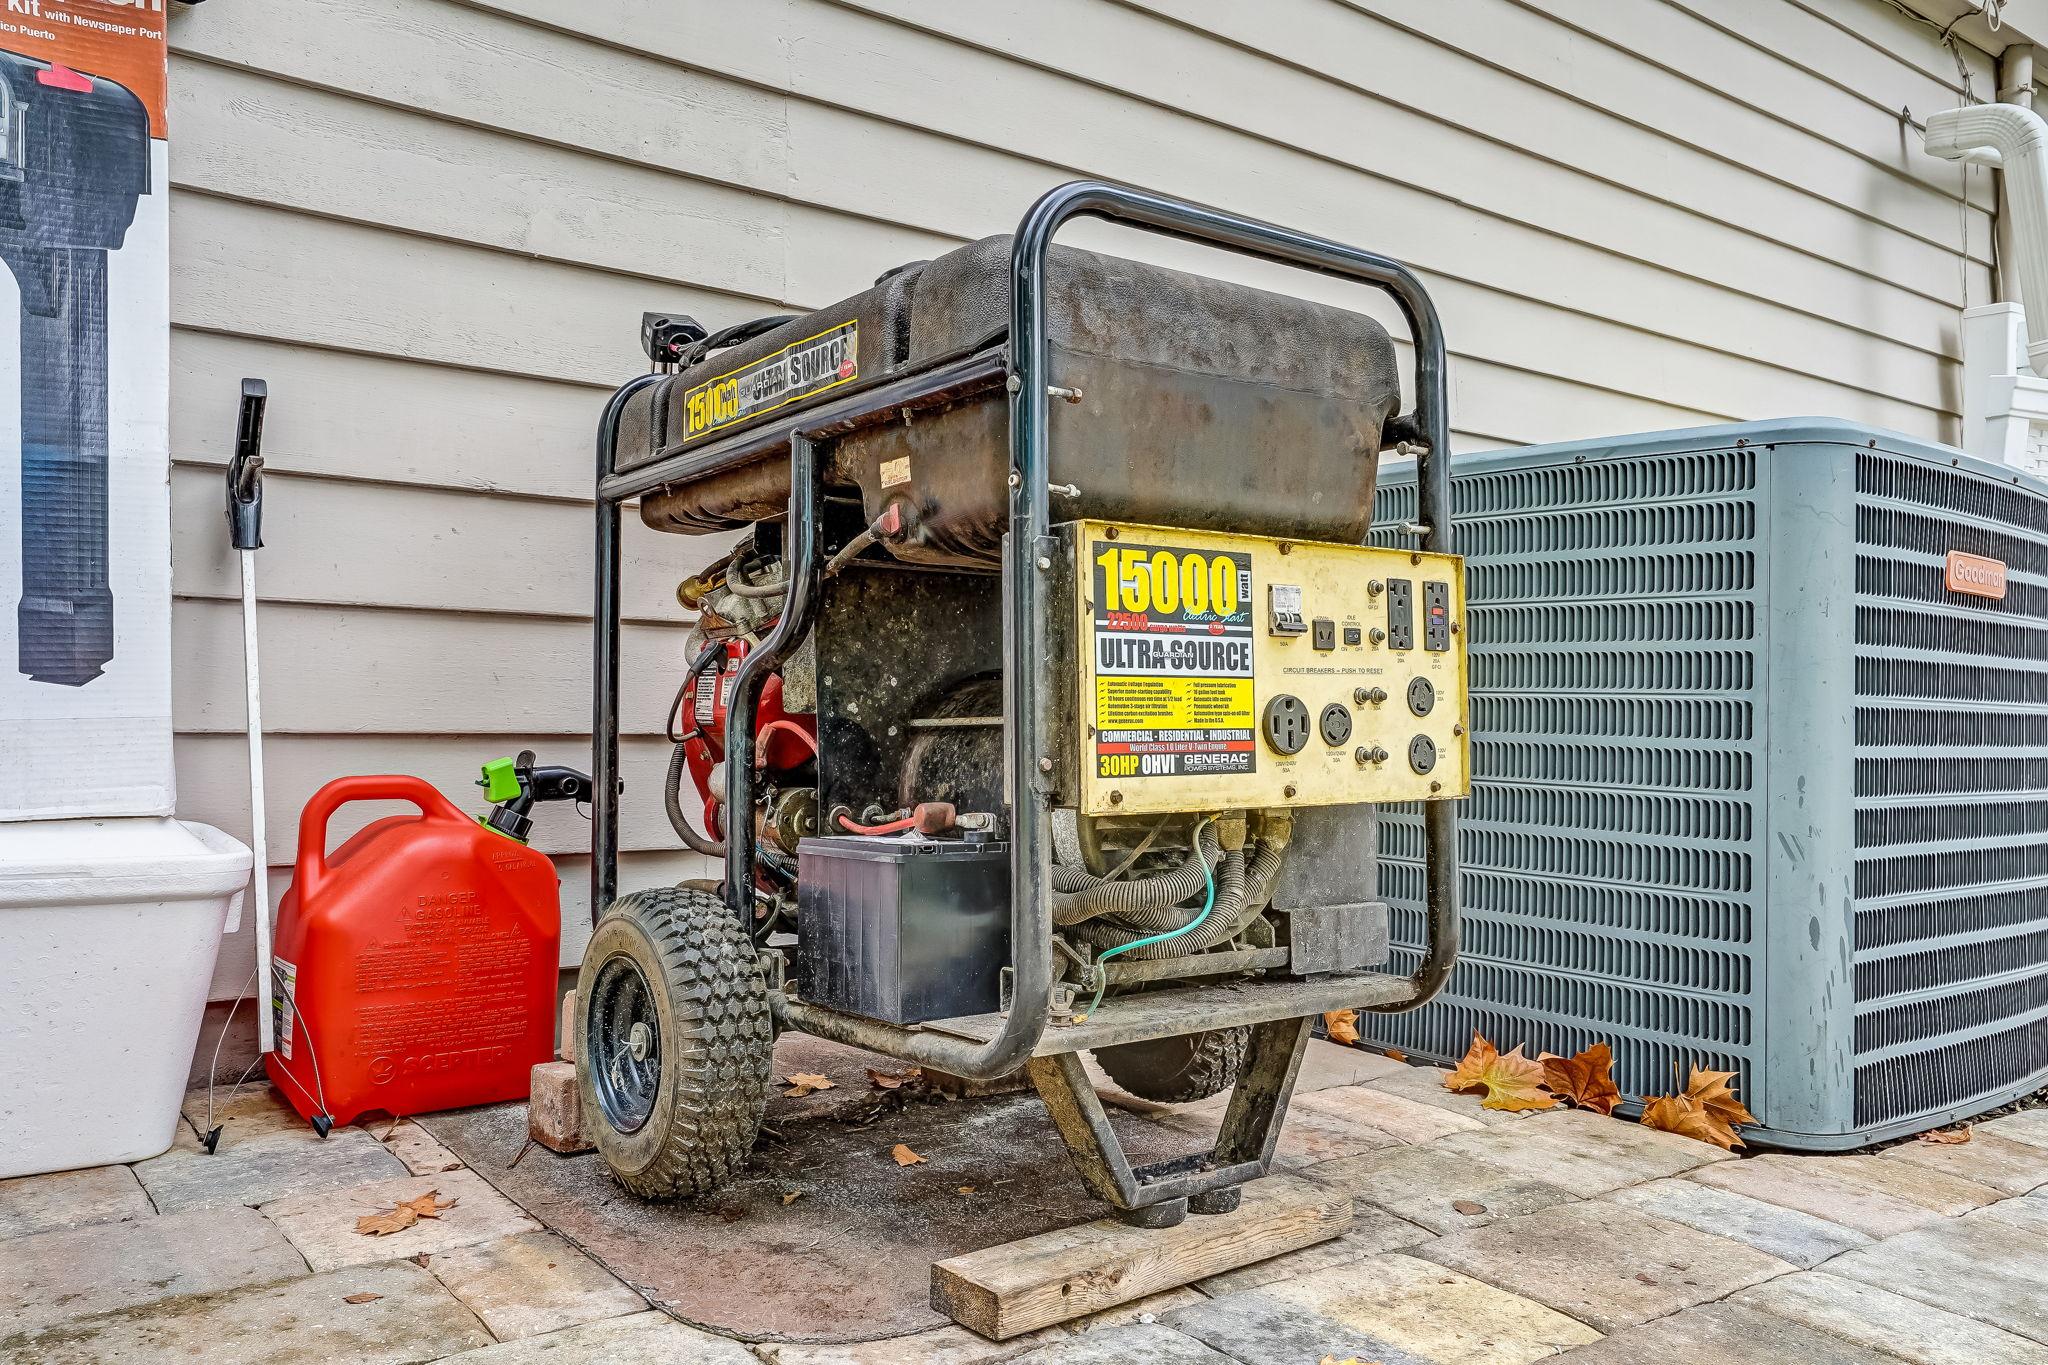 Generator included